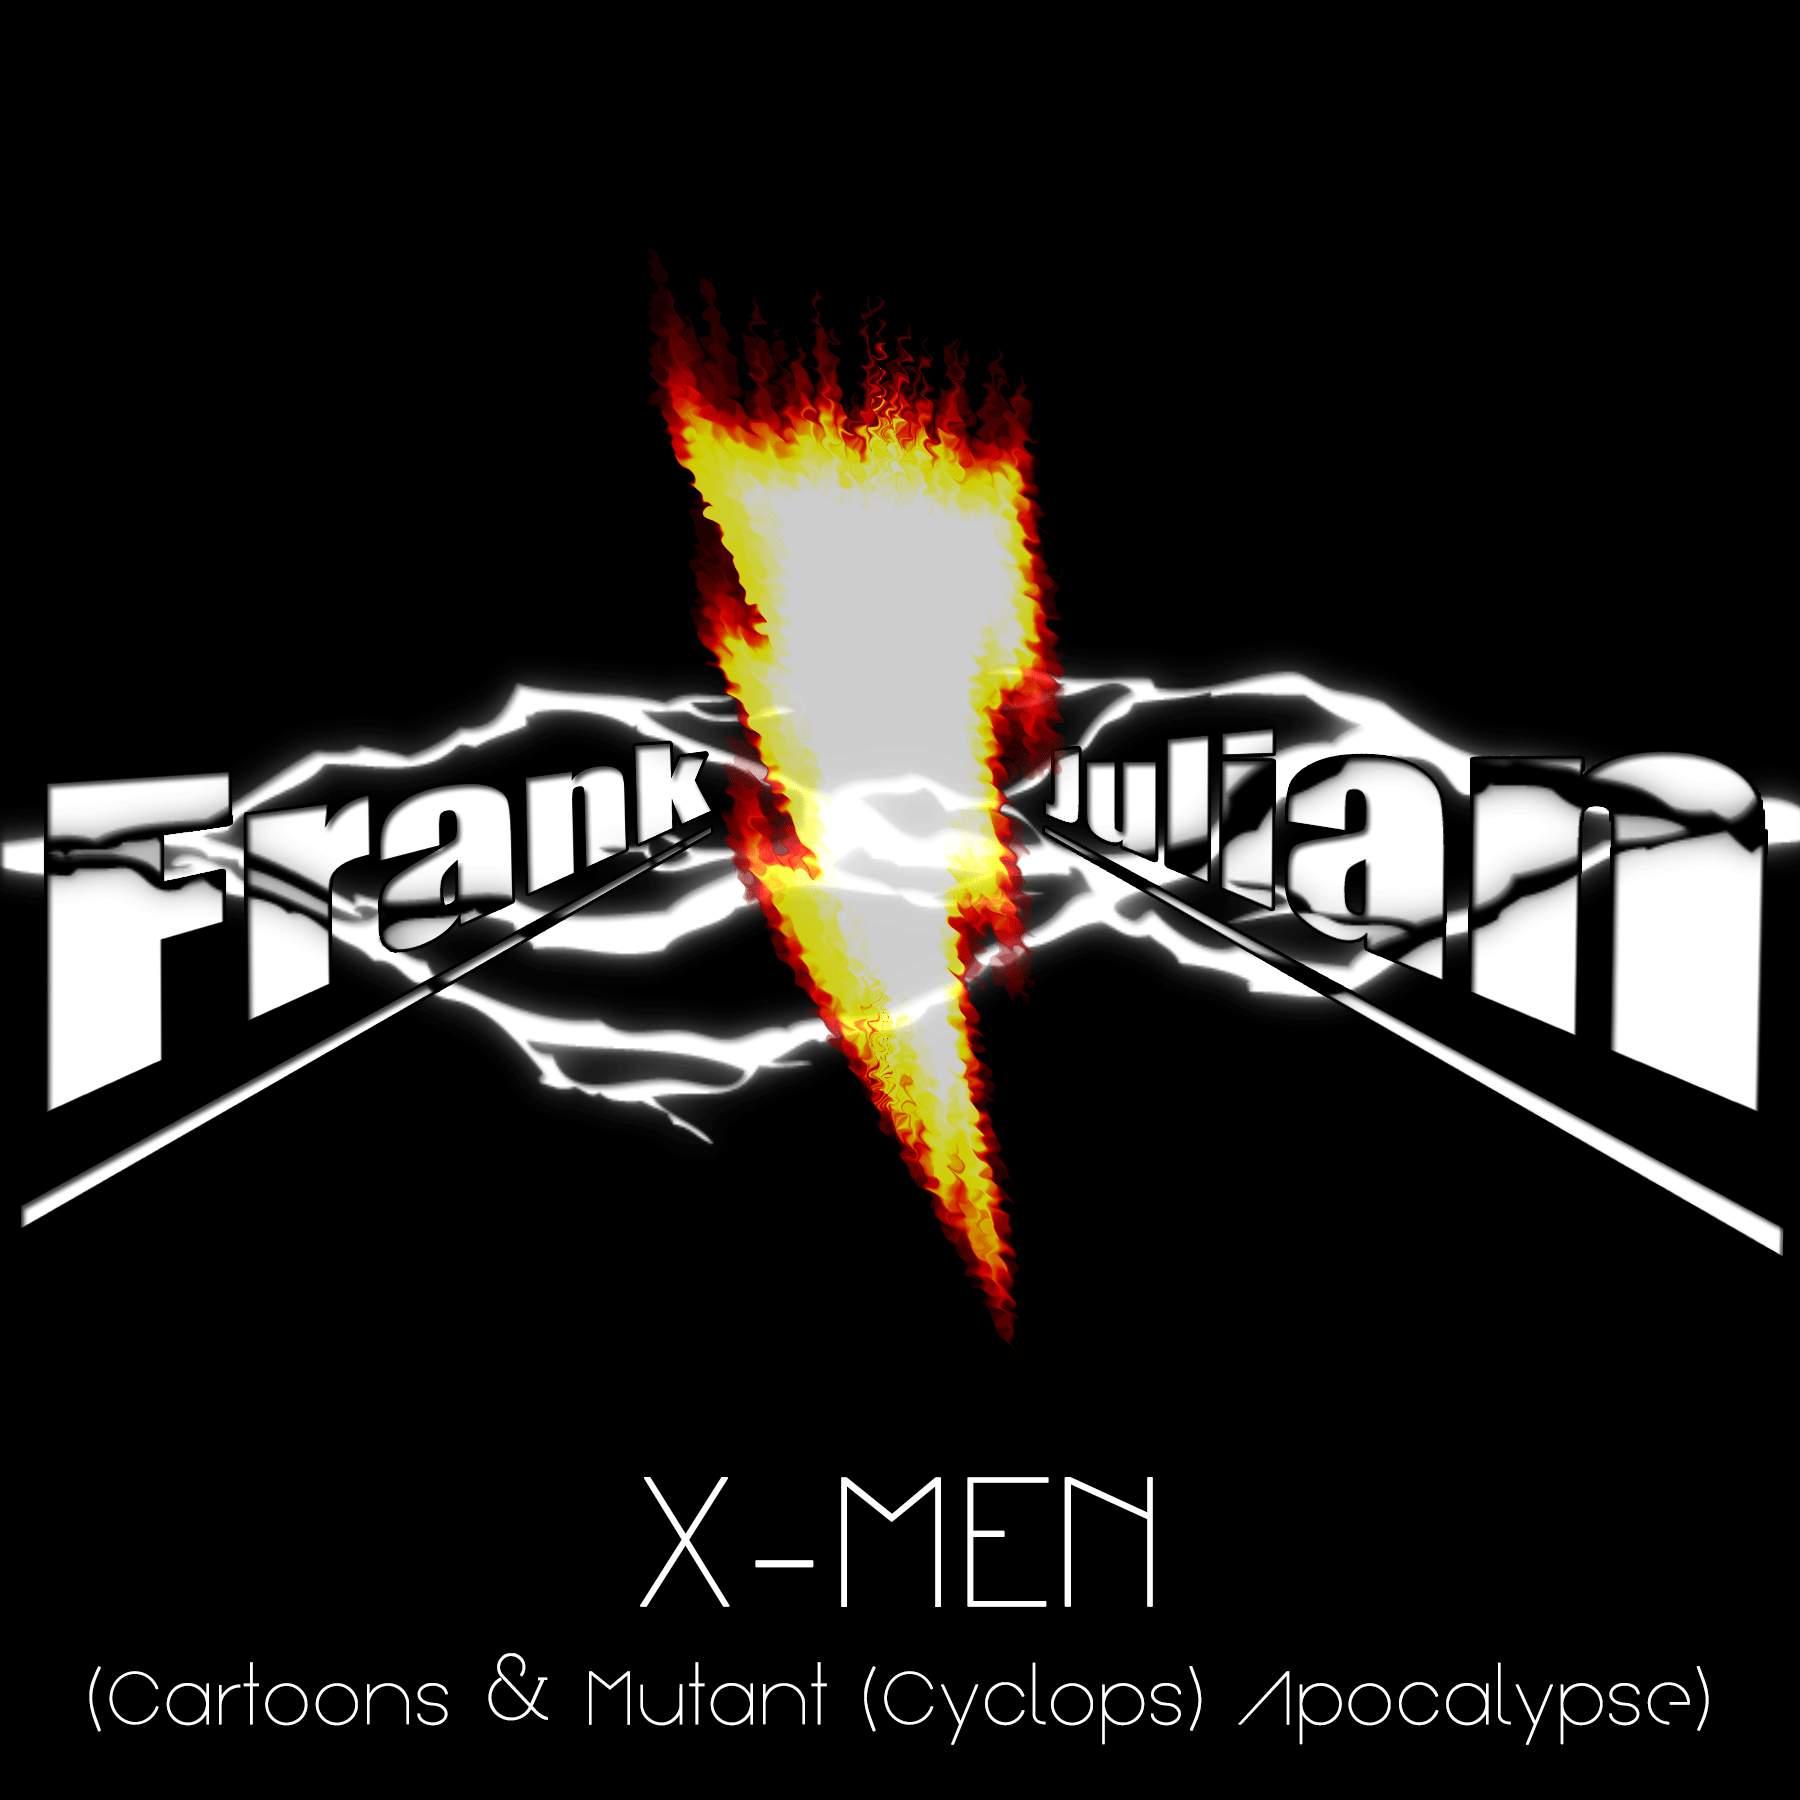 Julian, Frank: Frank Julian meets X-MEN: Cartoons & Mutant (Cyclops) Apocalypse (SNES Main Theme Metal Cover)